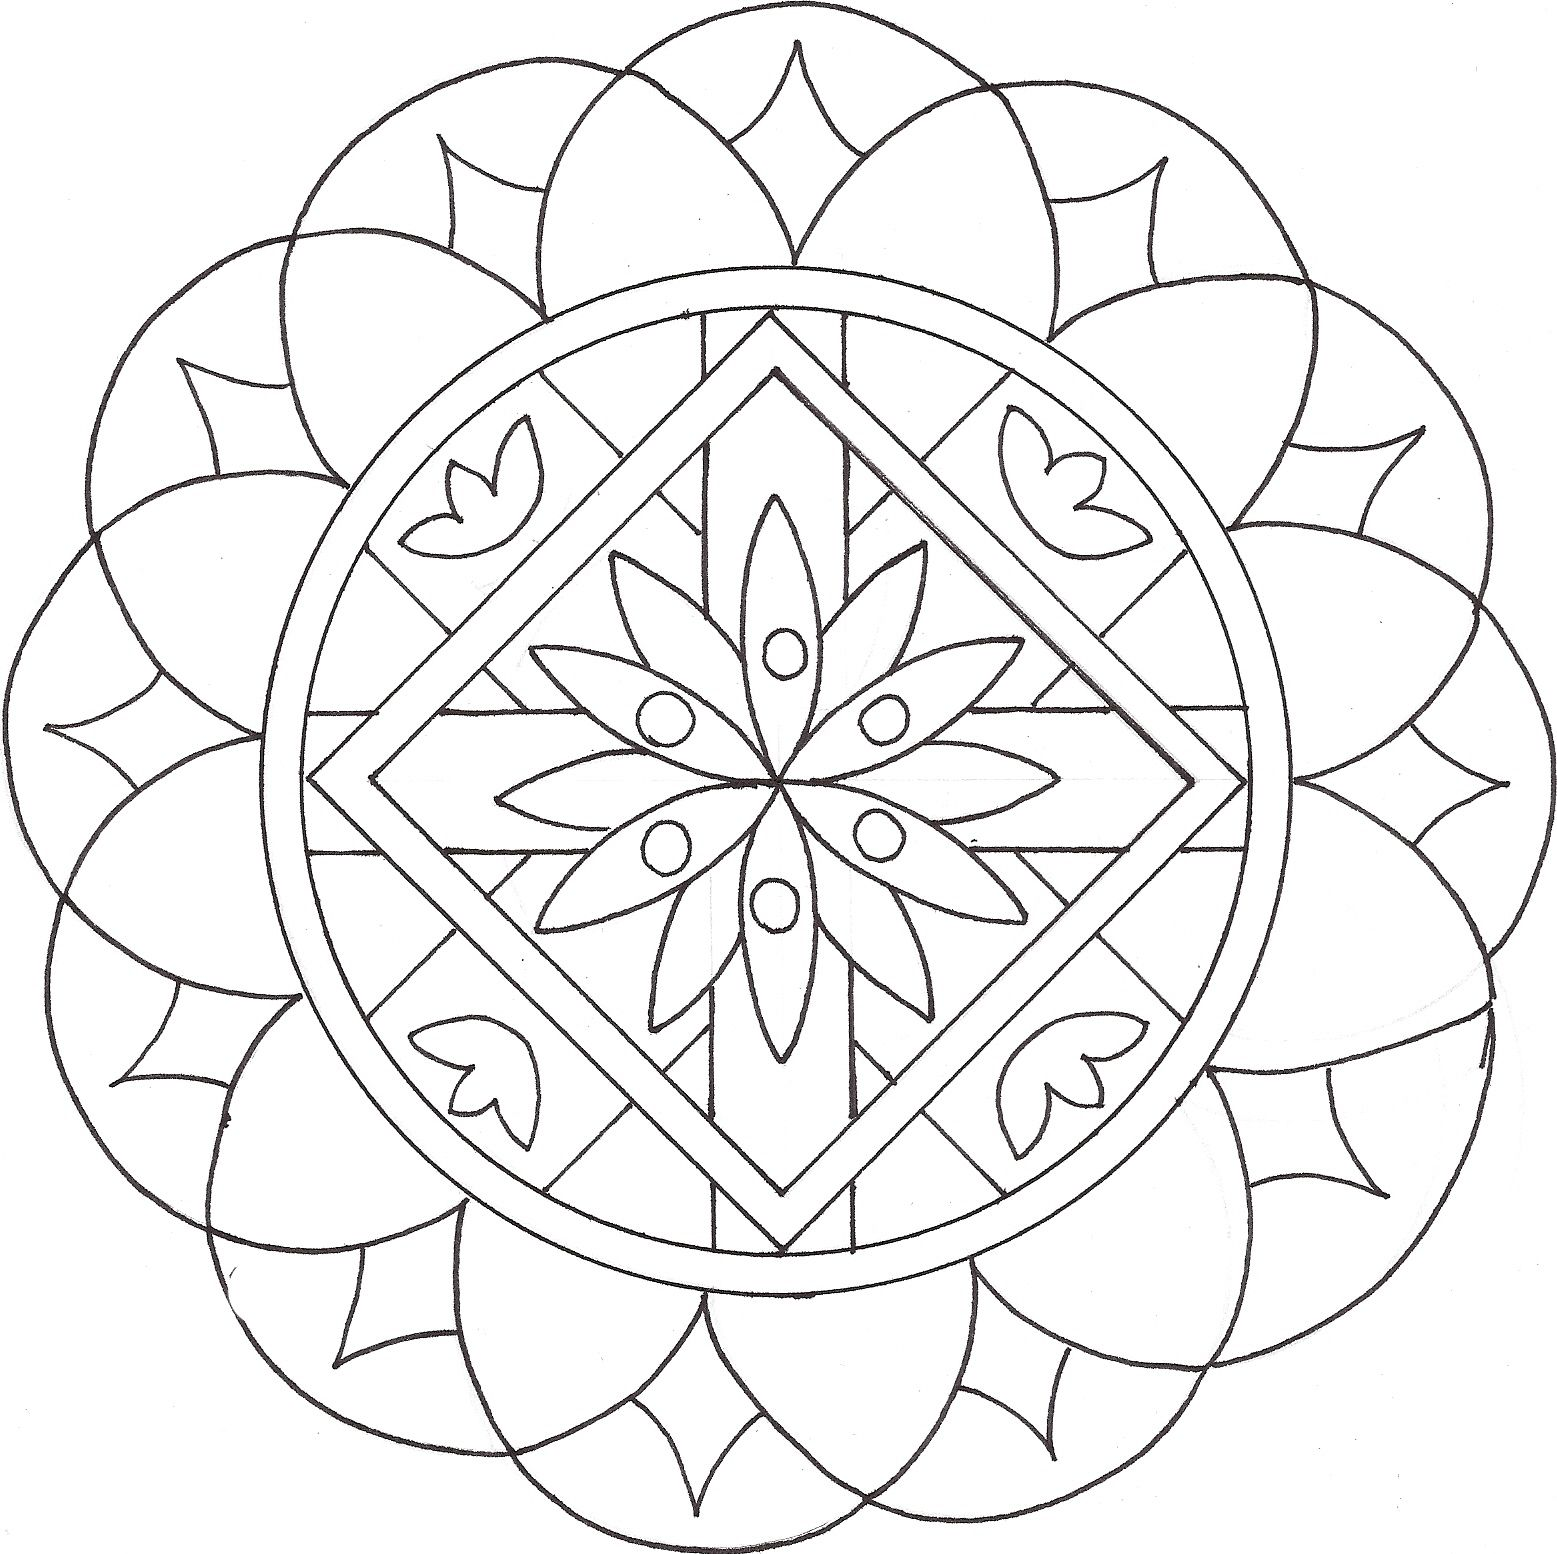 dibujos asimétricos para colorear - Buscar con Google | Mandalas ...